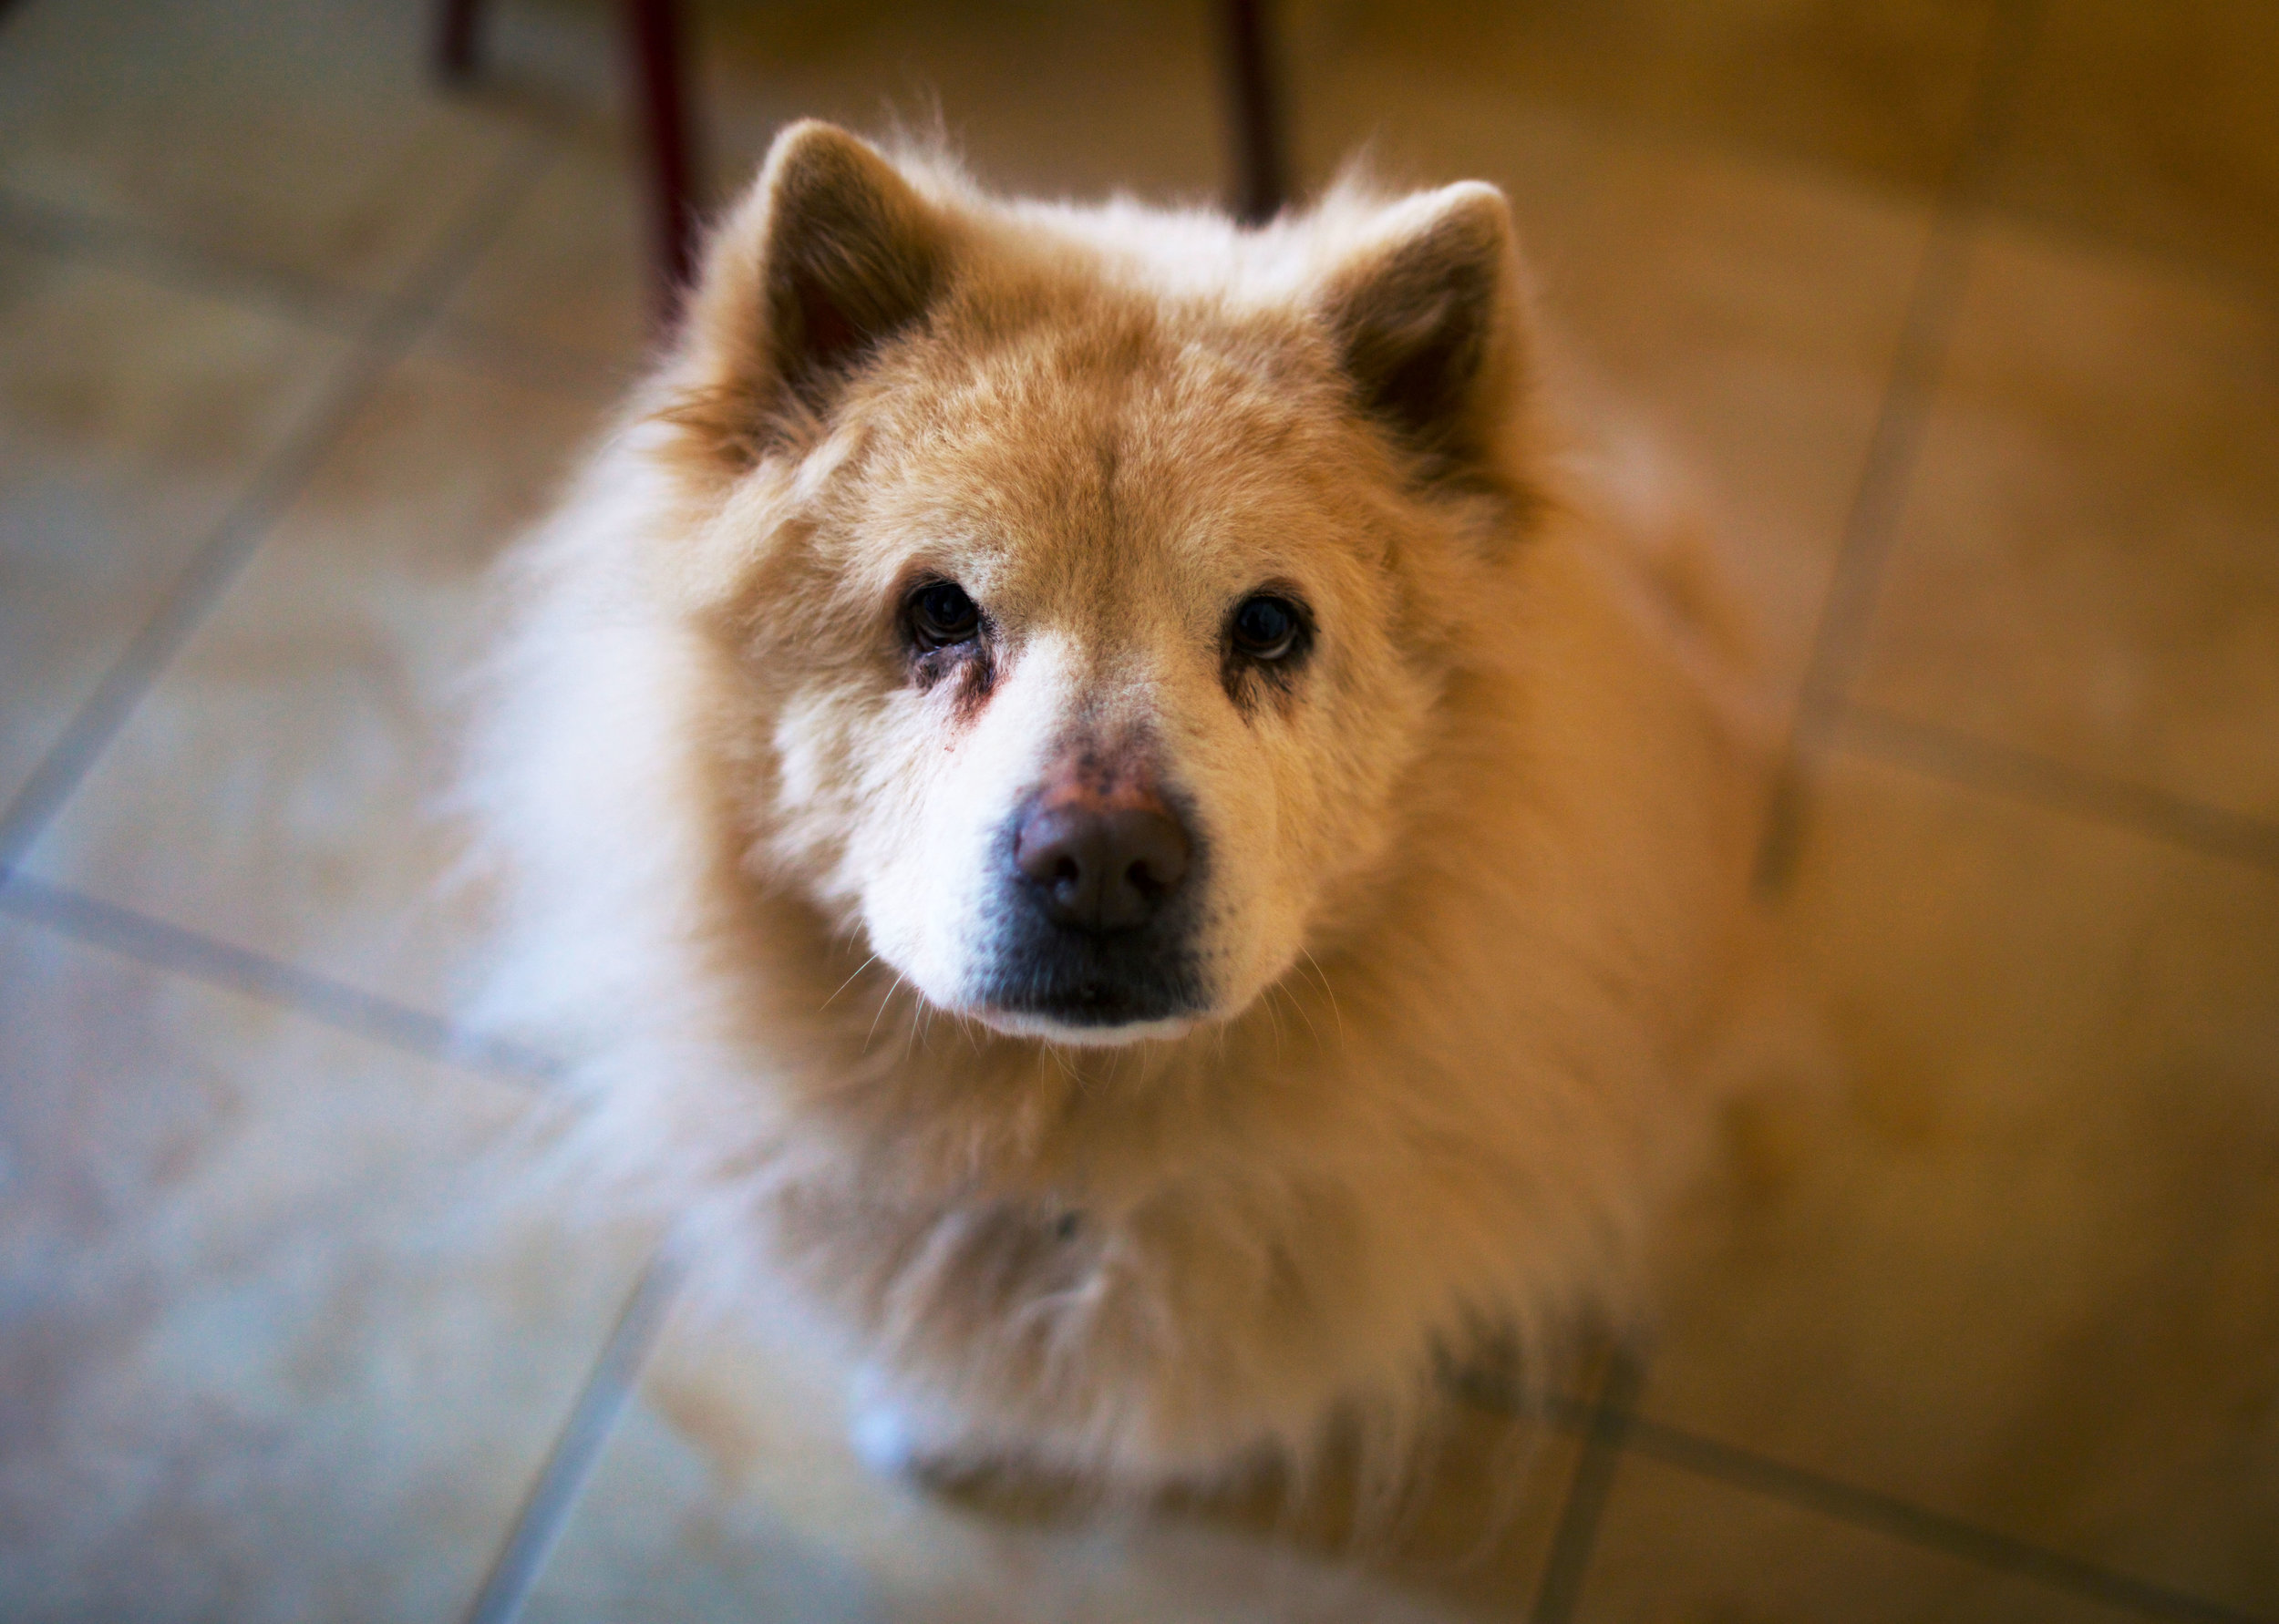 Savita's dog Cookie